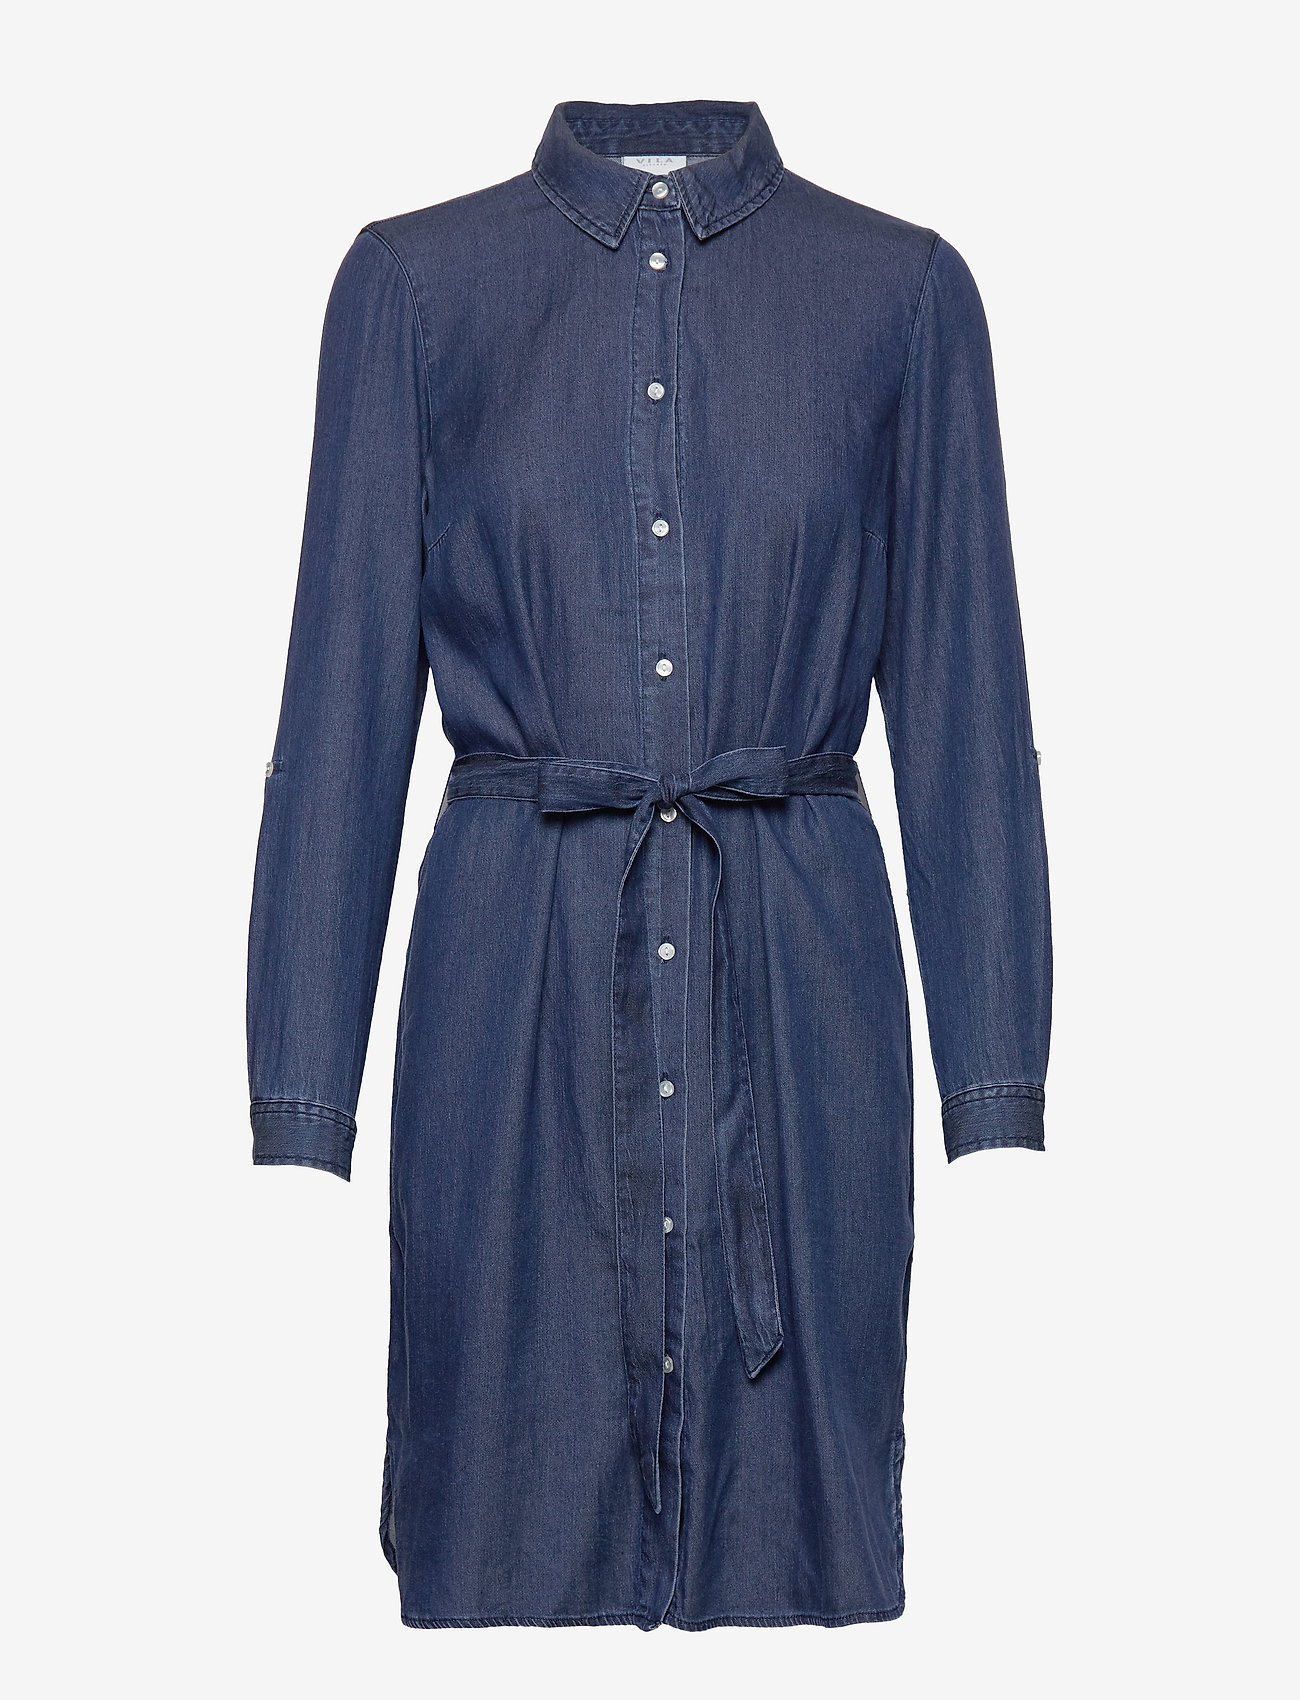 Vila - VIBISTA DENIM BELT DRESS/SU - NOOS - shirt dresses - dark blue denim - 0